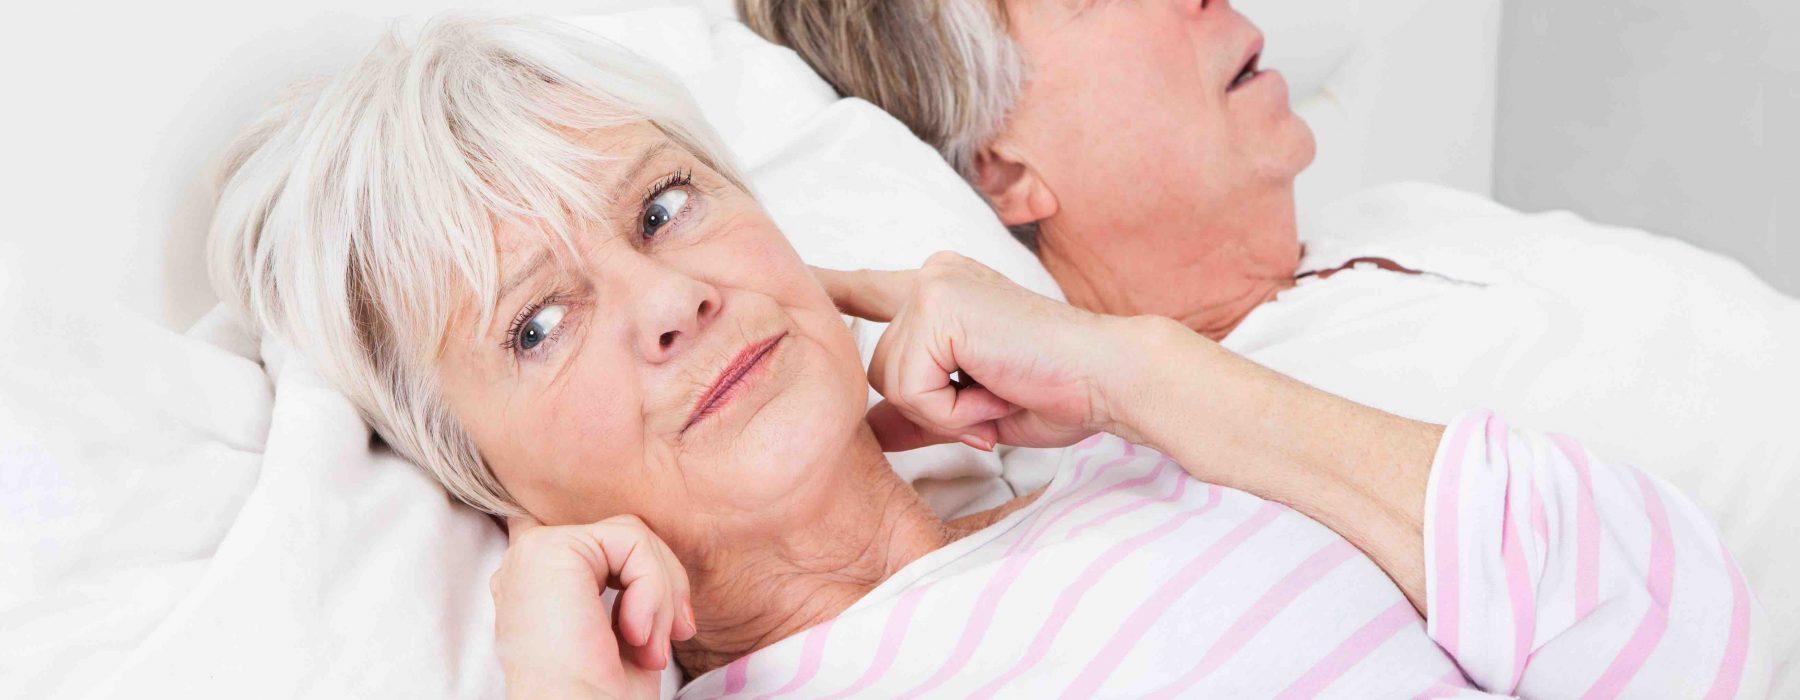 Sleep Apnea causes cardiovascular and memory problems